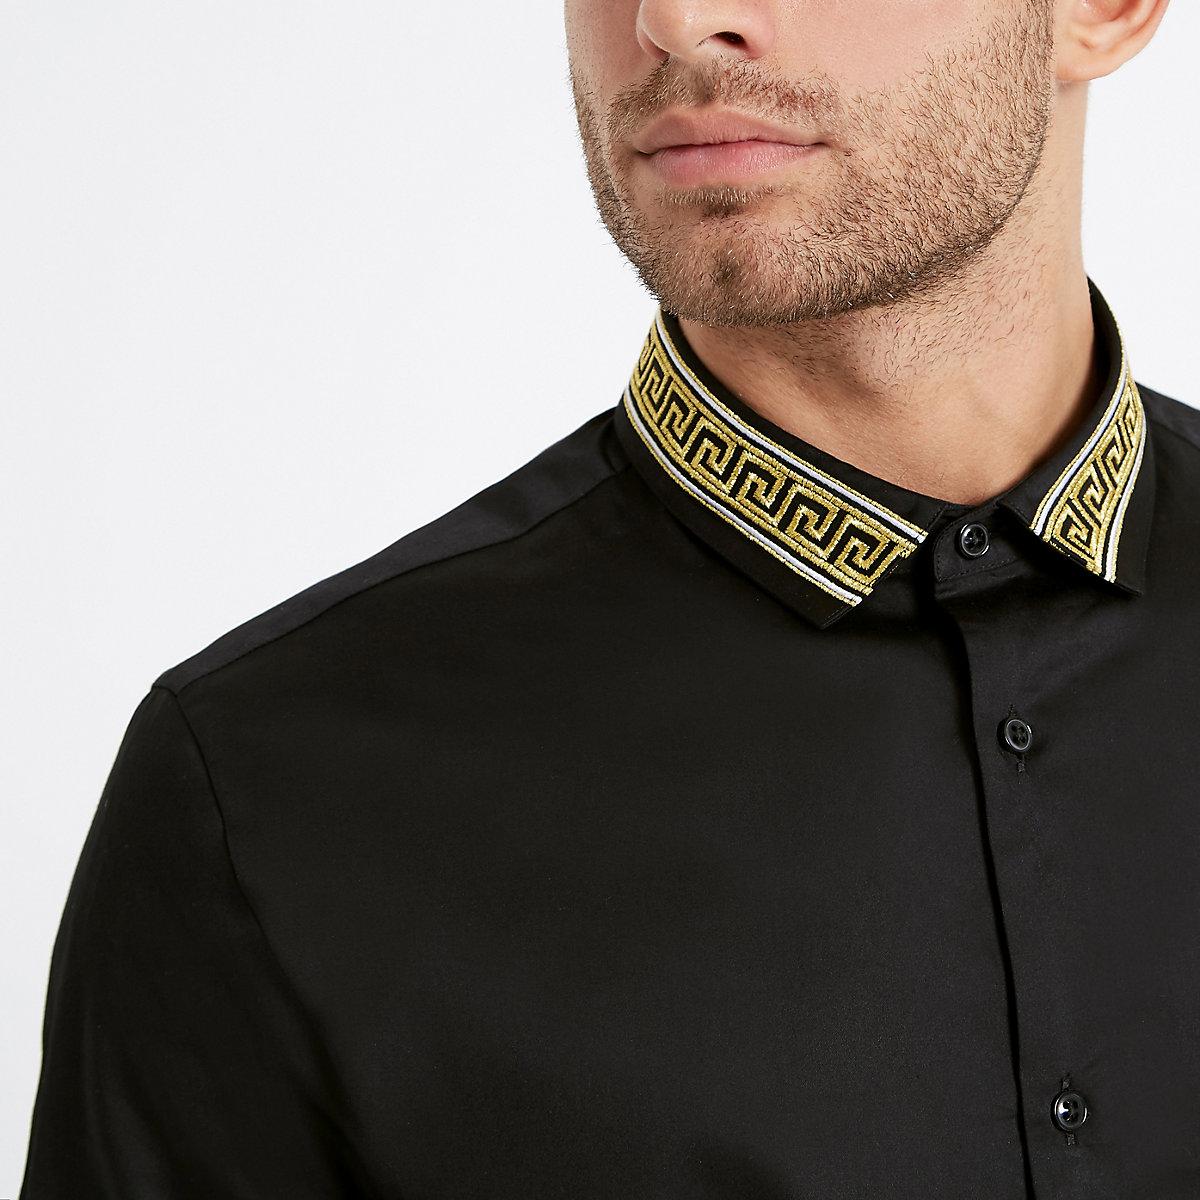 Black Gold Embroidered Collar Shirt Short Sleeve Shirts Shirts Men